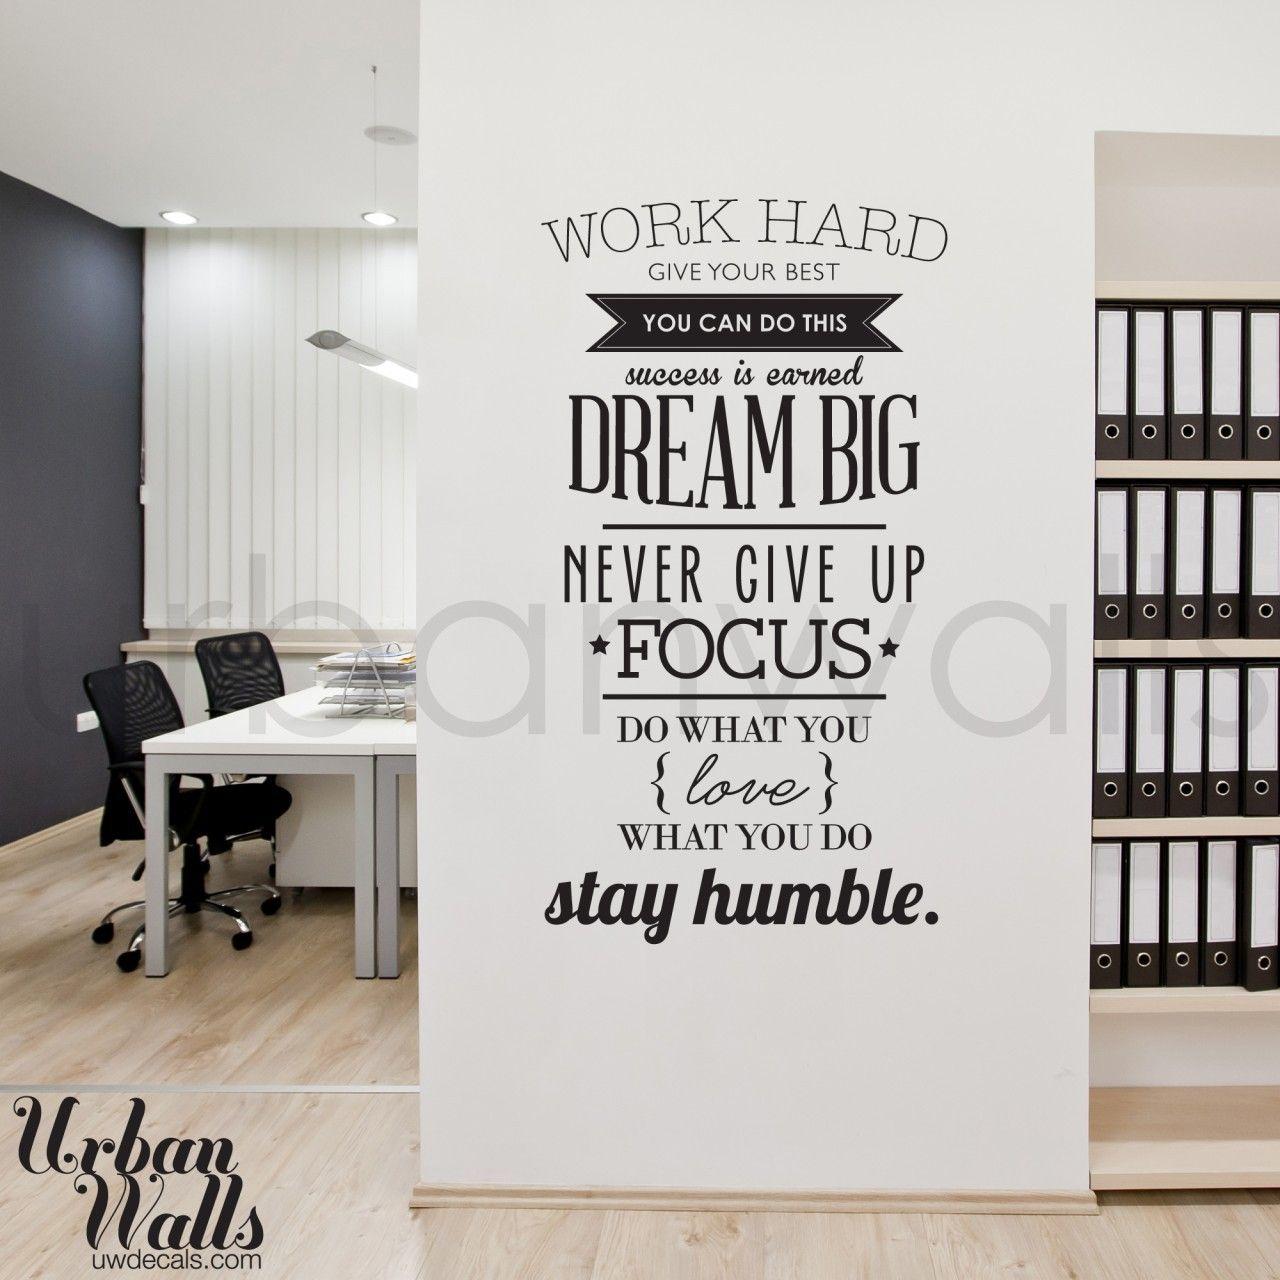 chiropractic office design 2015 | urban walls vinilo decorativo ...